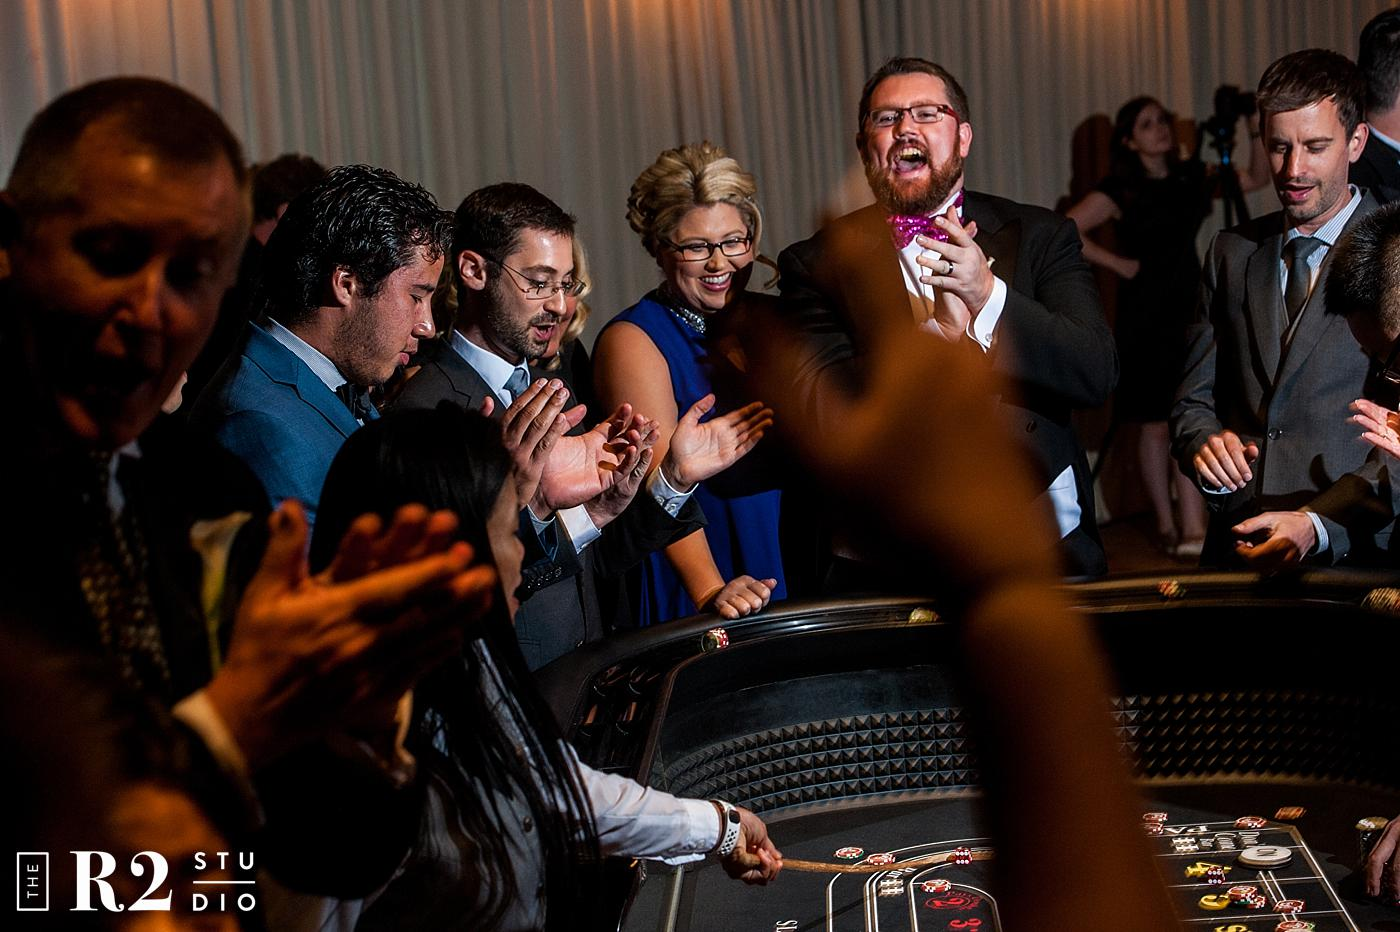 #slslasvegaswedding #slslasvegas #bazaarcasino #bazaarcasinolasvegas #bazaarcasinolasvegaswedding #crapswedding #weddinggaming #casinowedding #lasvegascasinowedding #desirableeventsbydesi, #weddingplannerlasvegas,#lasvegasweddingcoordinators,#weddingcoordinatorslasvegas,#weddingcoordinatorlasvegas,#lasvegasweddingplanner #desirableeventsbydesi #Tropicanawedding #wedding, #love, #lovewins, #samesexwedding, #gaywedding, #tropicana, #lasvegaswedding, #weddinglasvegas, #weddingplannerslasvegas, #lasvegasweddingplanners, # layersoflovely, #lasvegaswedding, #susieandwill, #rusticwedding, #wedding, #historic5thstreetschool, #downtownlasvegas, #sls, #sayersclub, #bazaarmeats, #slslv, #slslasvegas #slsweddings, #lasvegasweddings, #gamblingtableswedding, #lasvegasweddinggambling